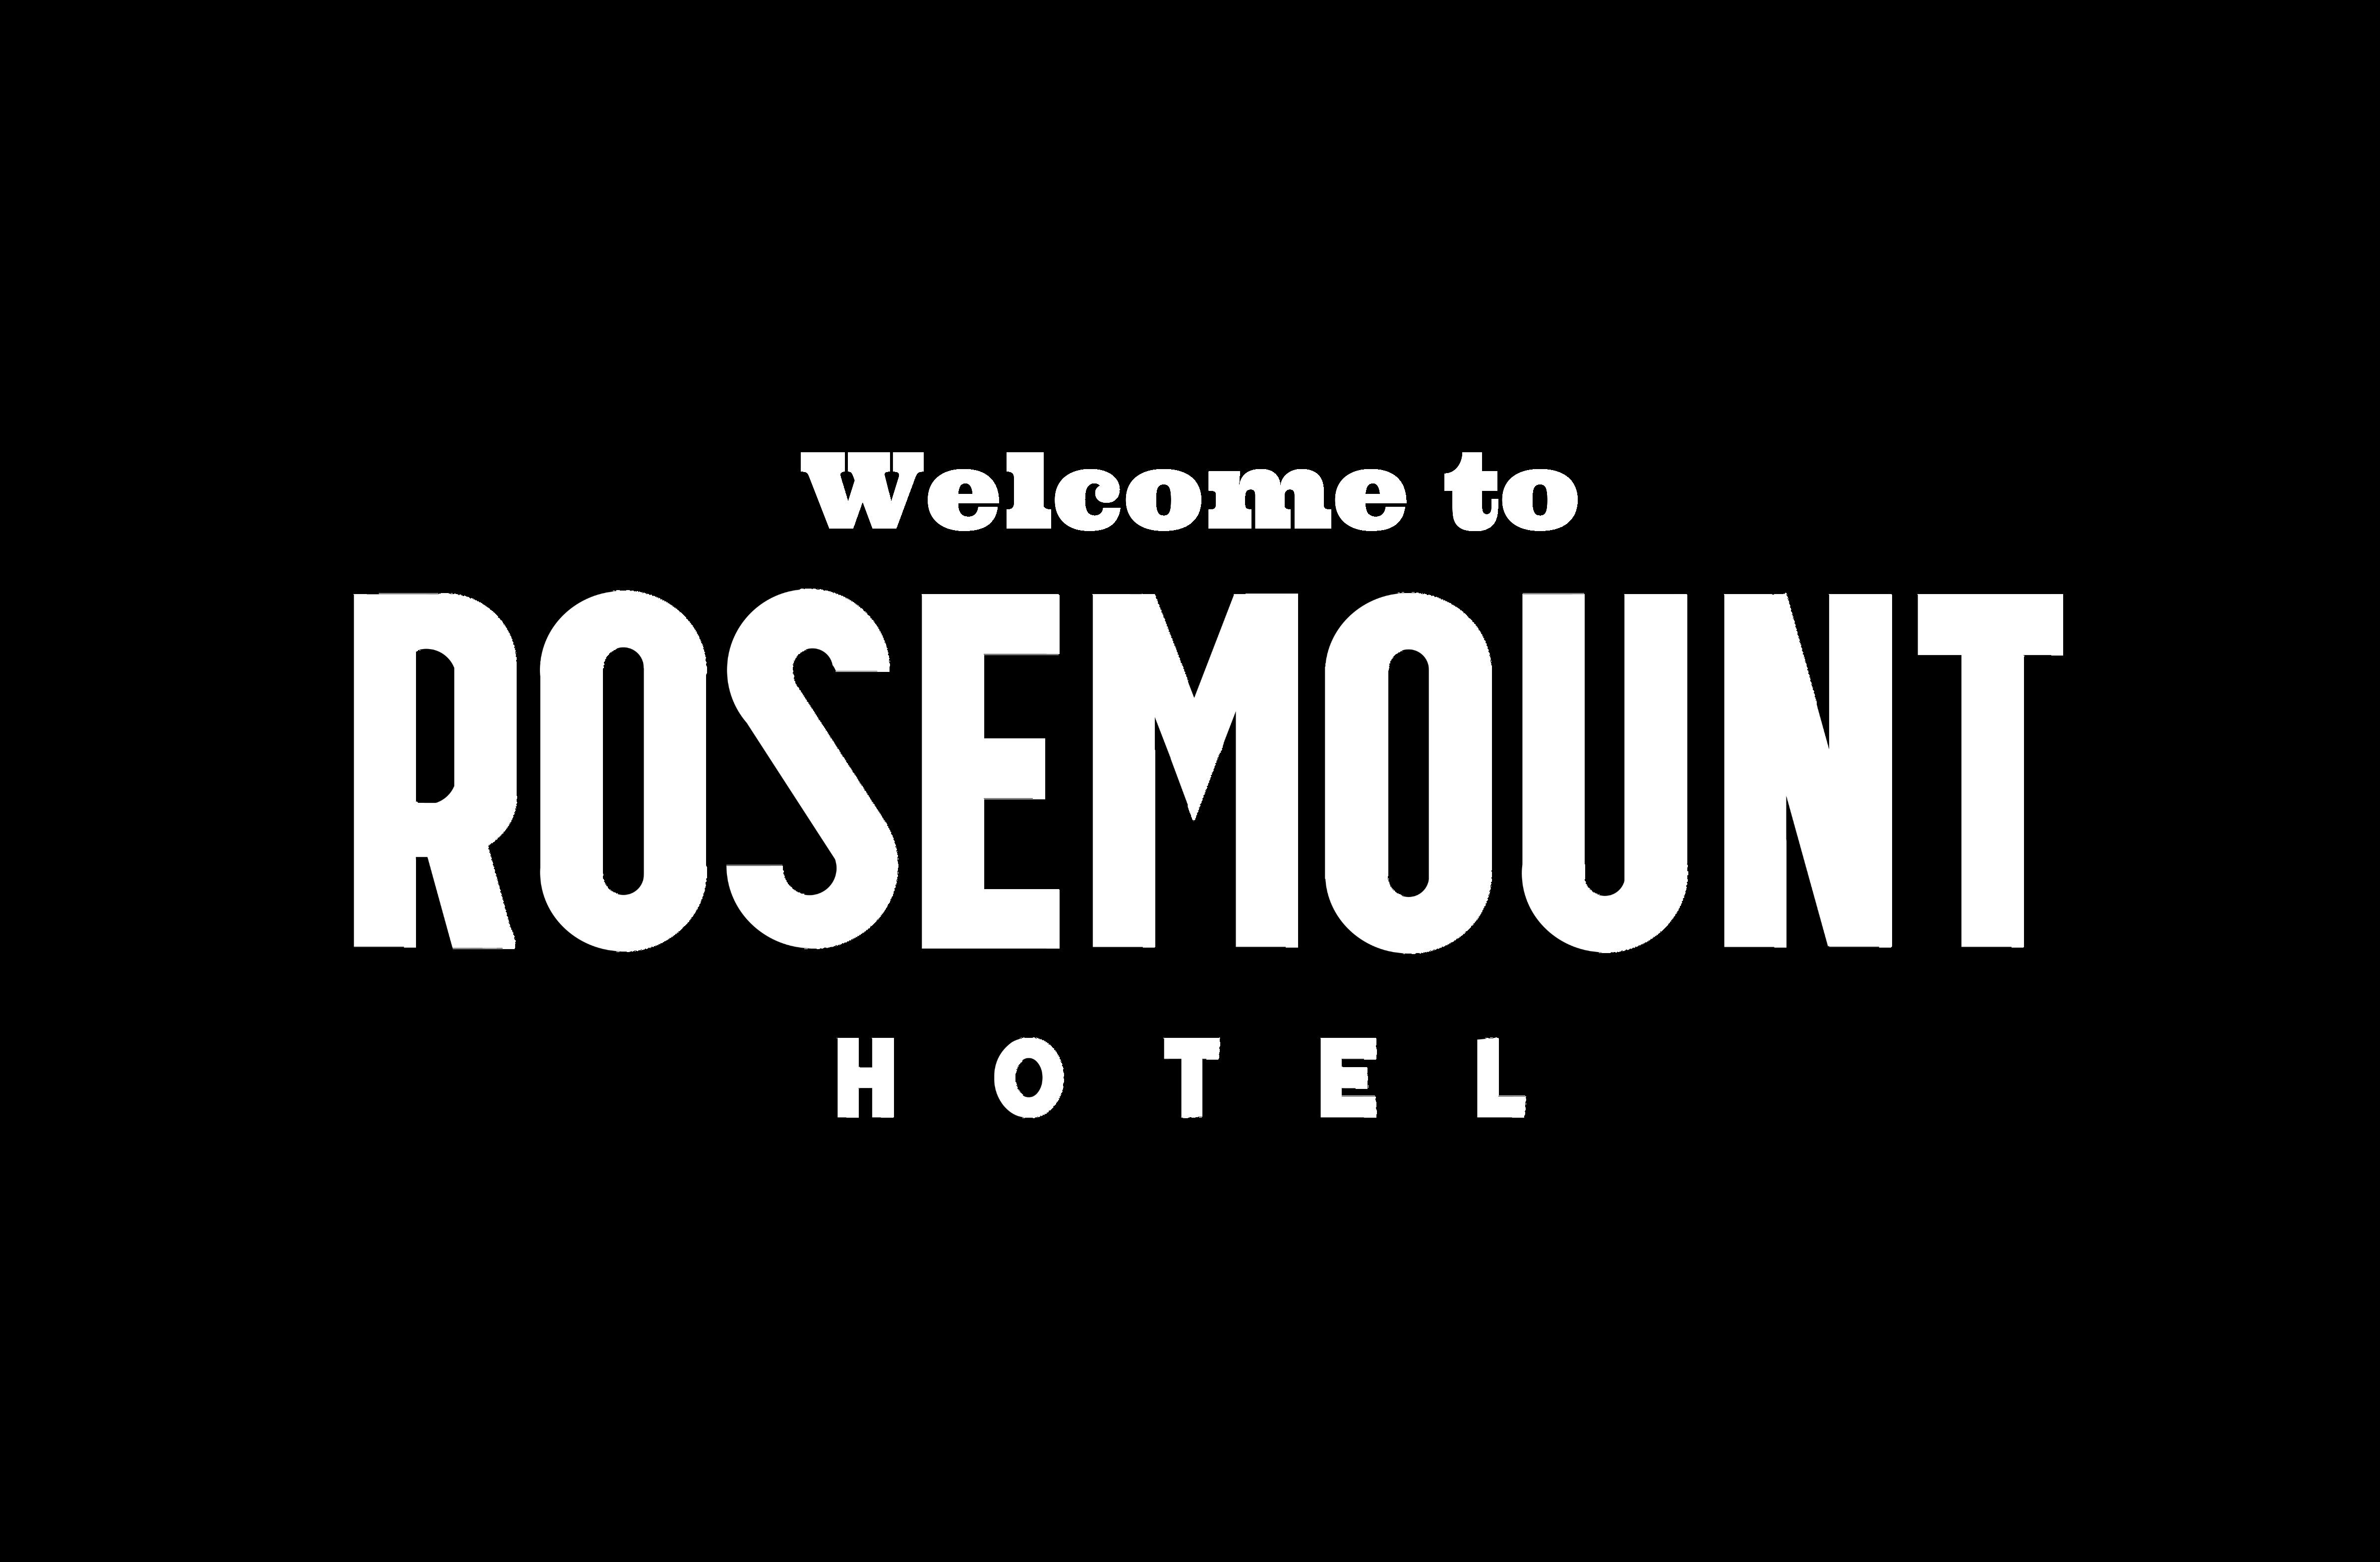 Rosemount Home page Web Banner (6)